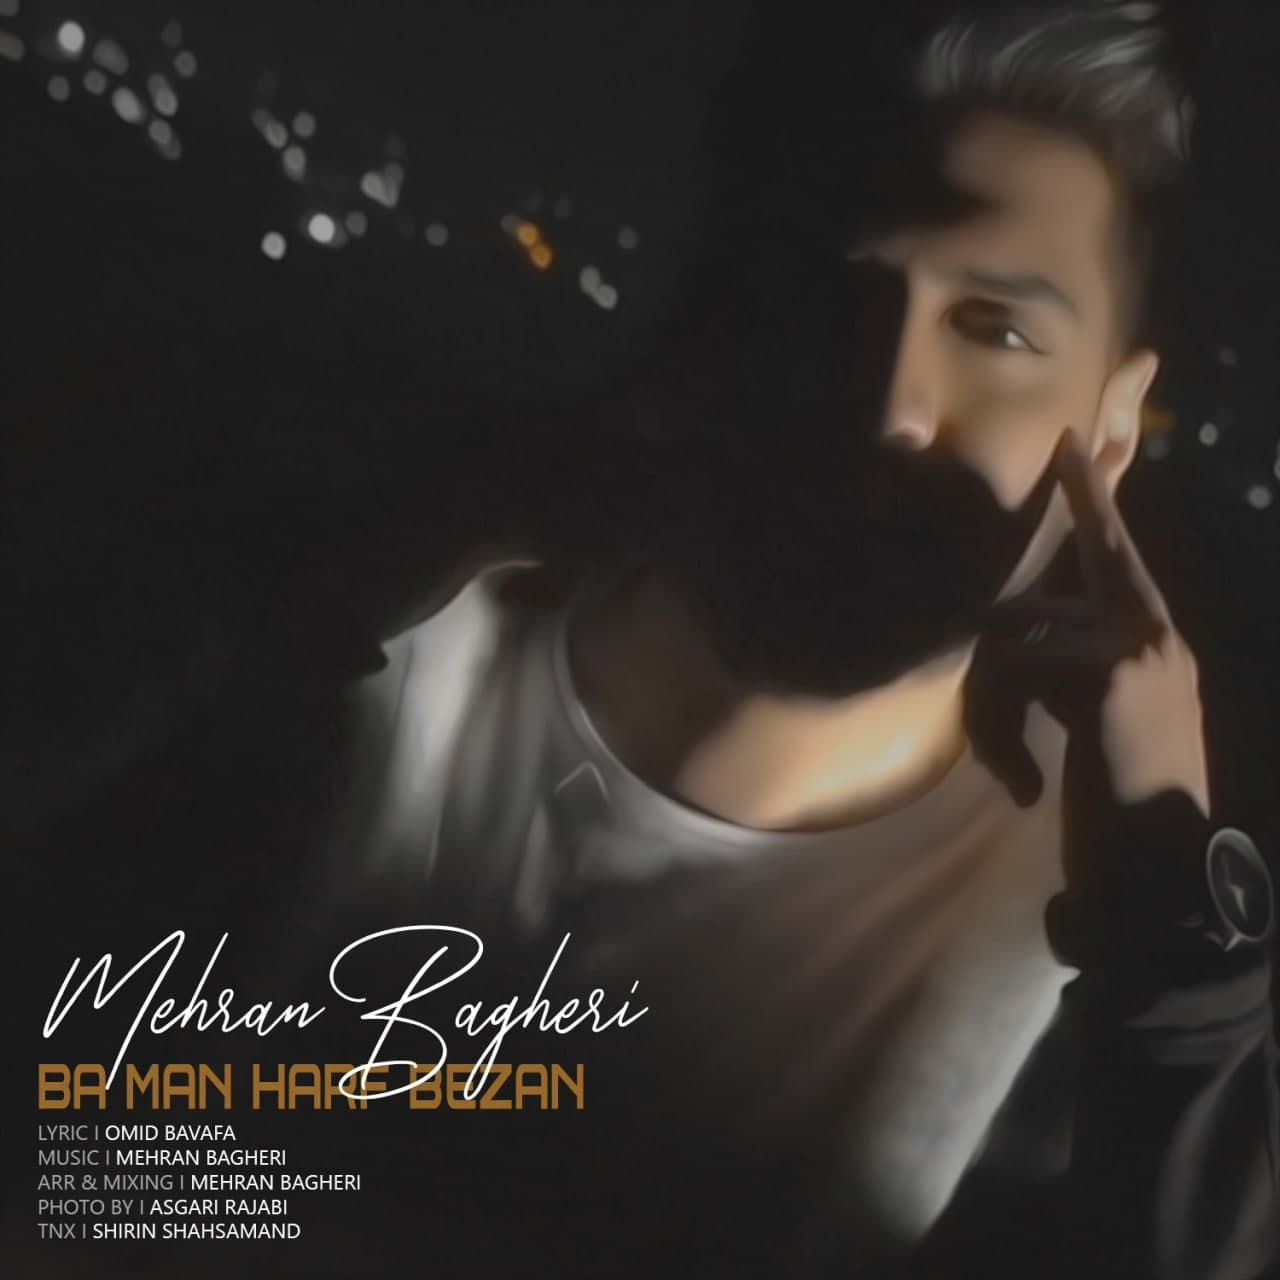 Mehran Bagheri – Ba Man Harf Bezan